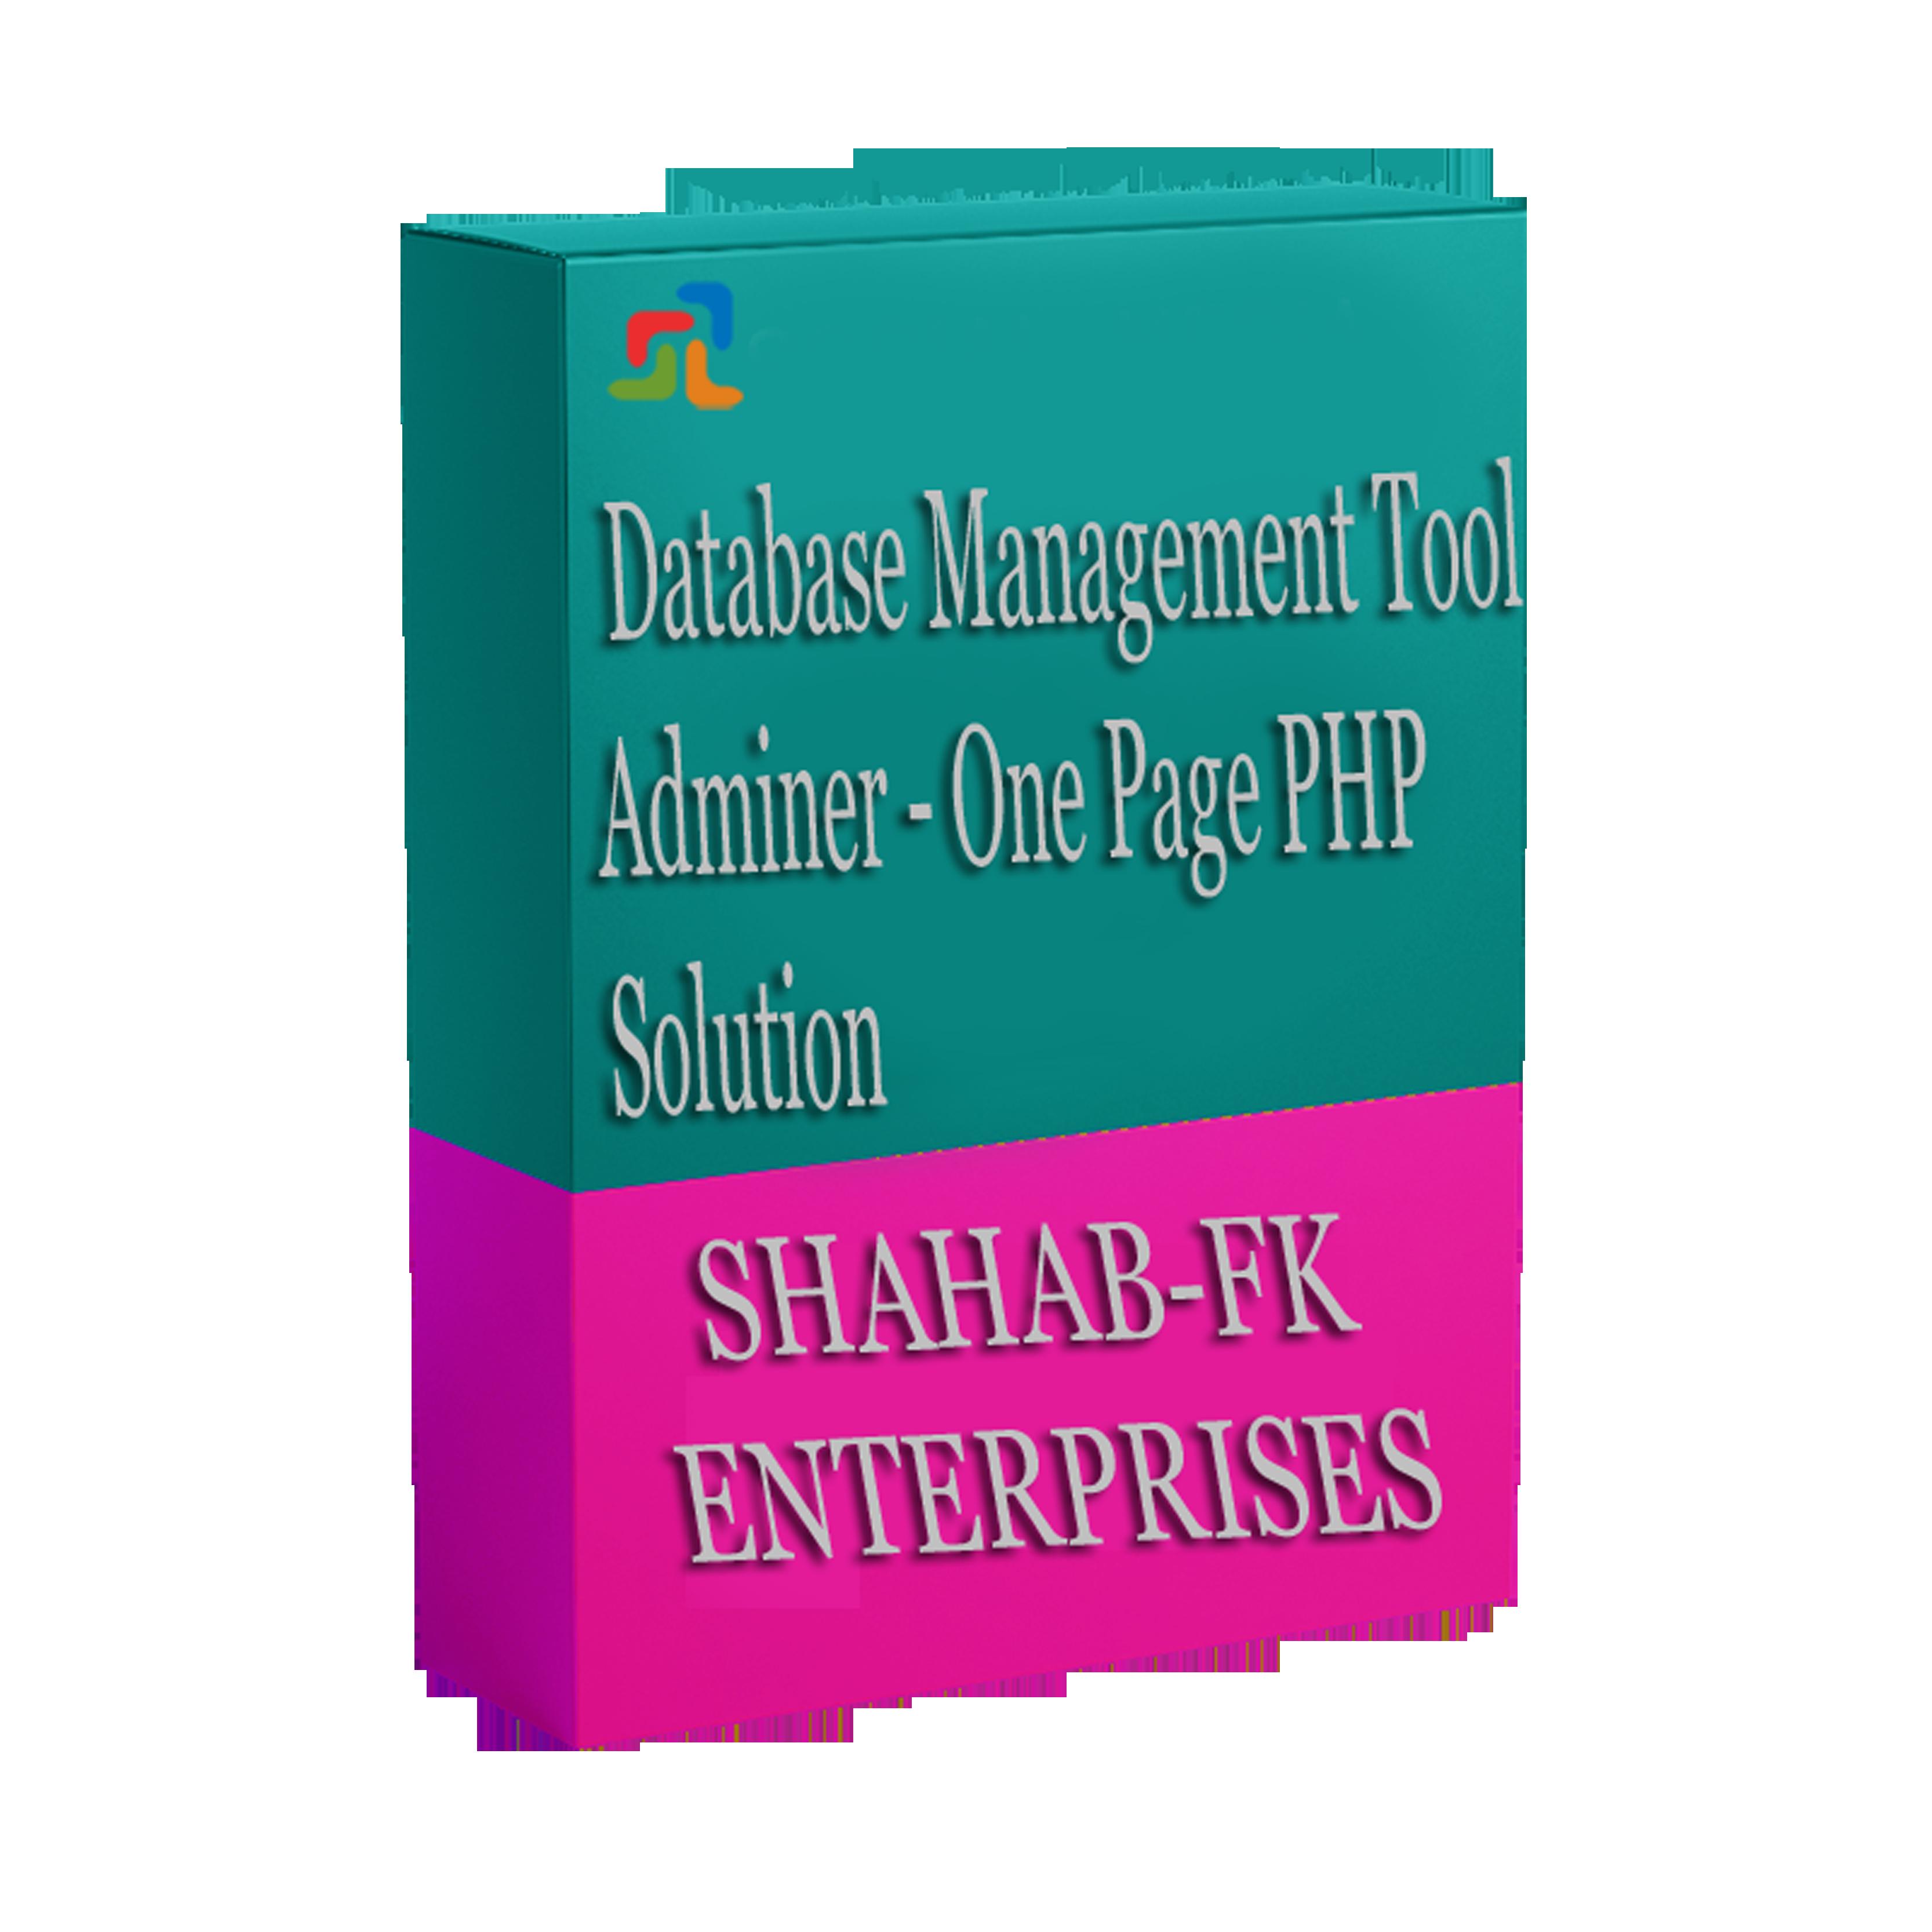 shahab Prestashop Extension: PrestaShop Database Management Tool Adminer Integration